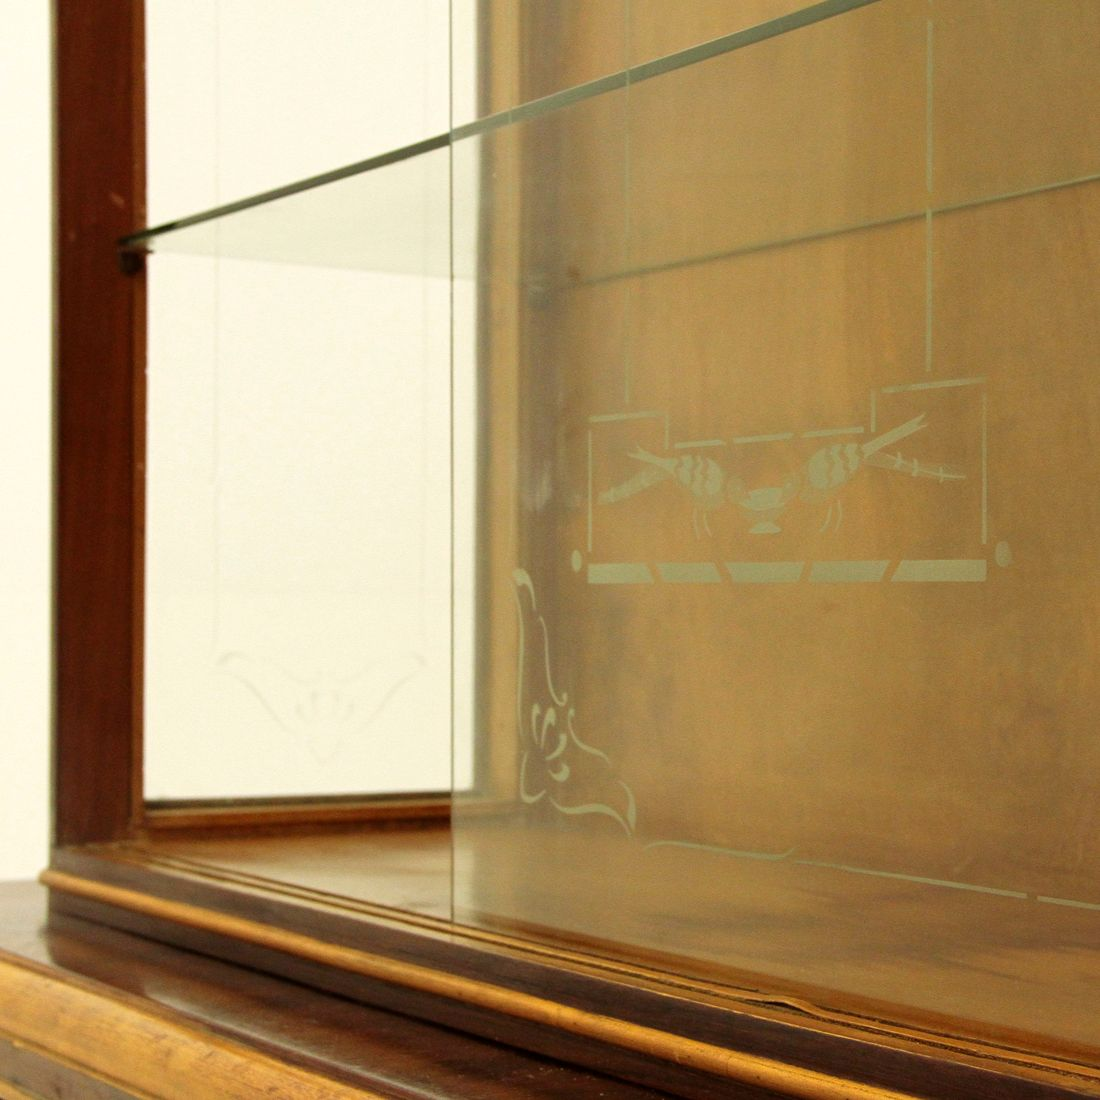 vitrine art d co en verre italie 1940s en vente sur pamono. Black Bedroom Furniture Sets. Home Design Ideas